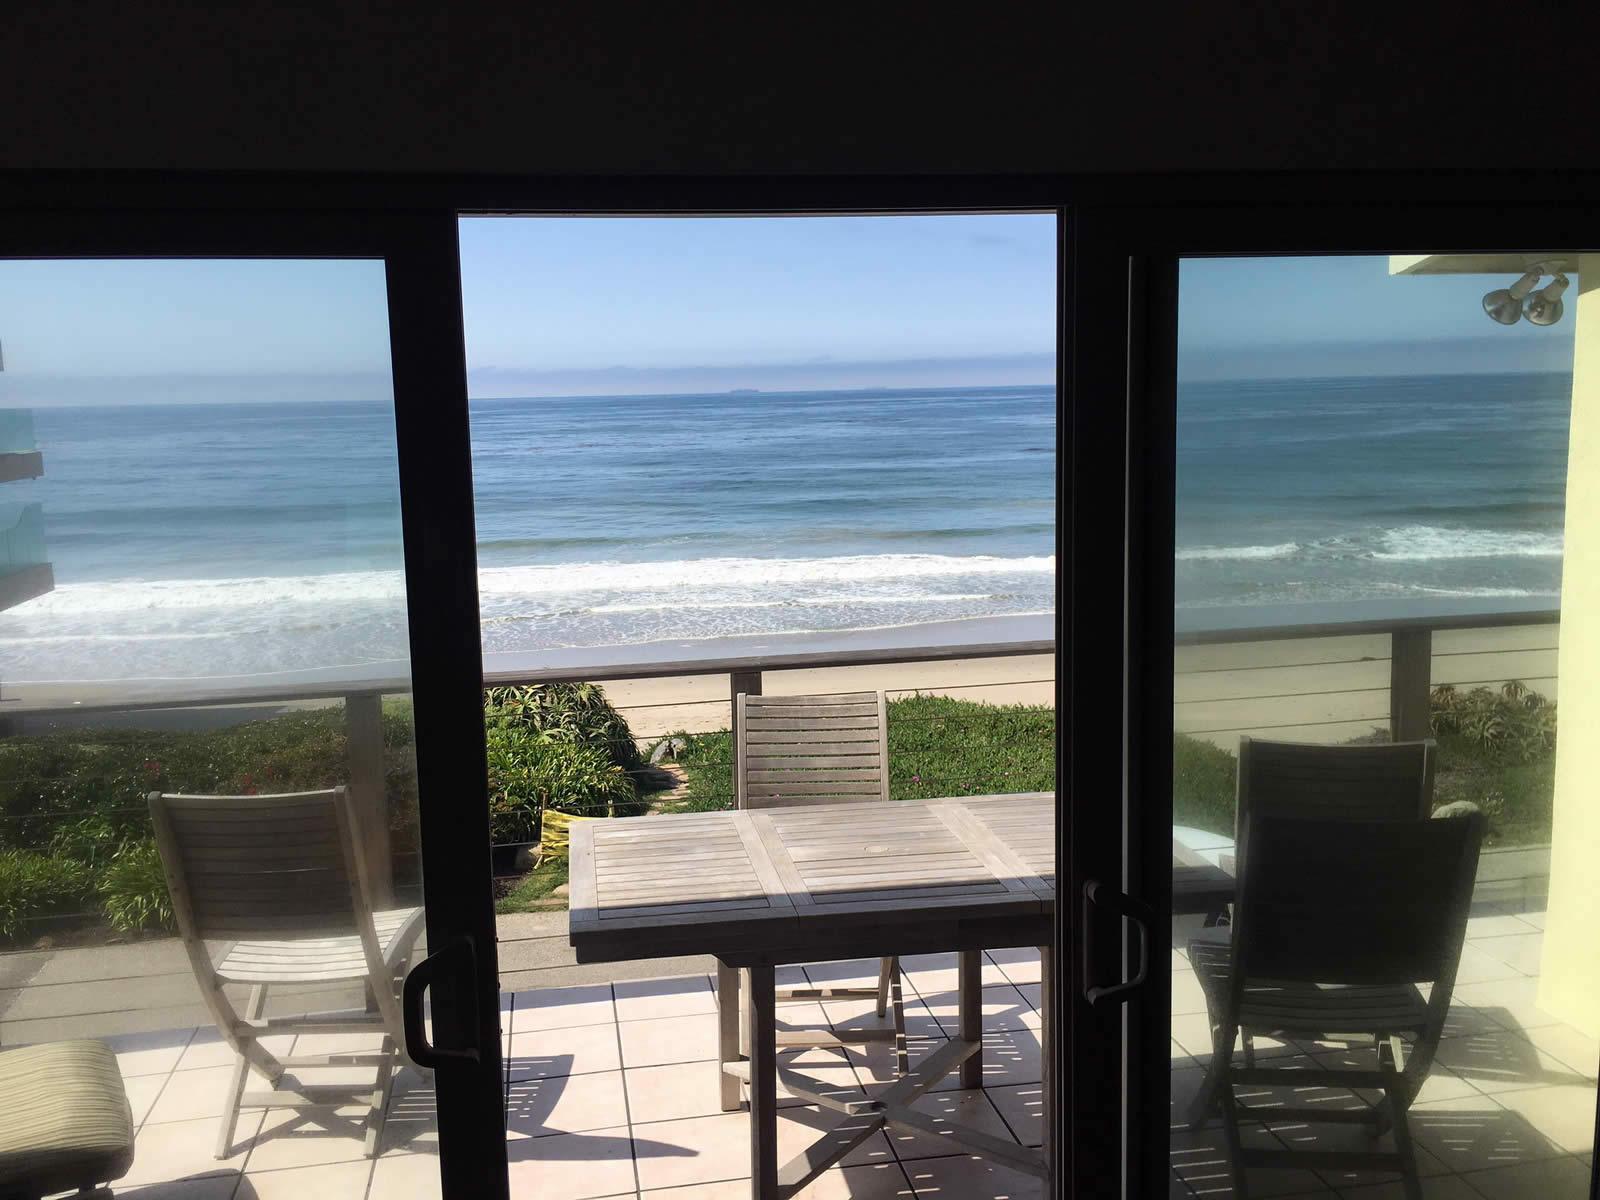 beach-house-a-vendre-malibu-residence-privee-balcon-vue-panoramique-ocean